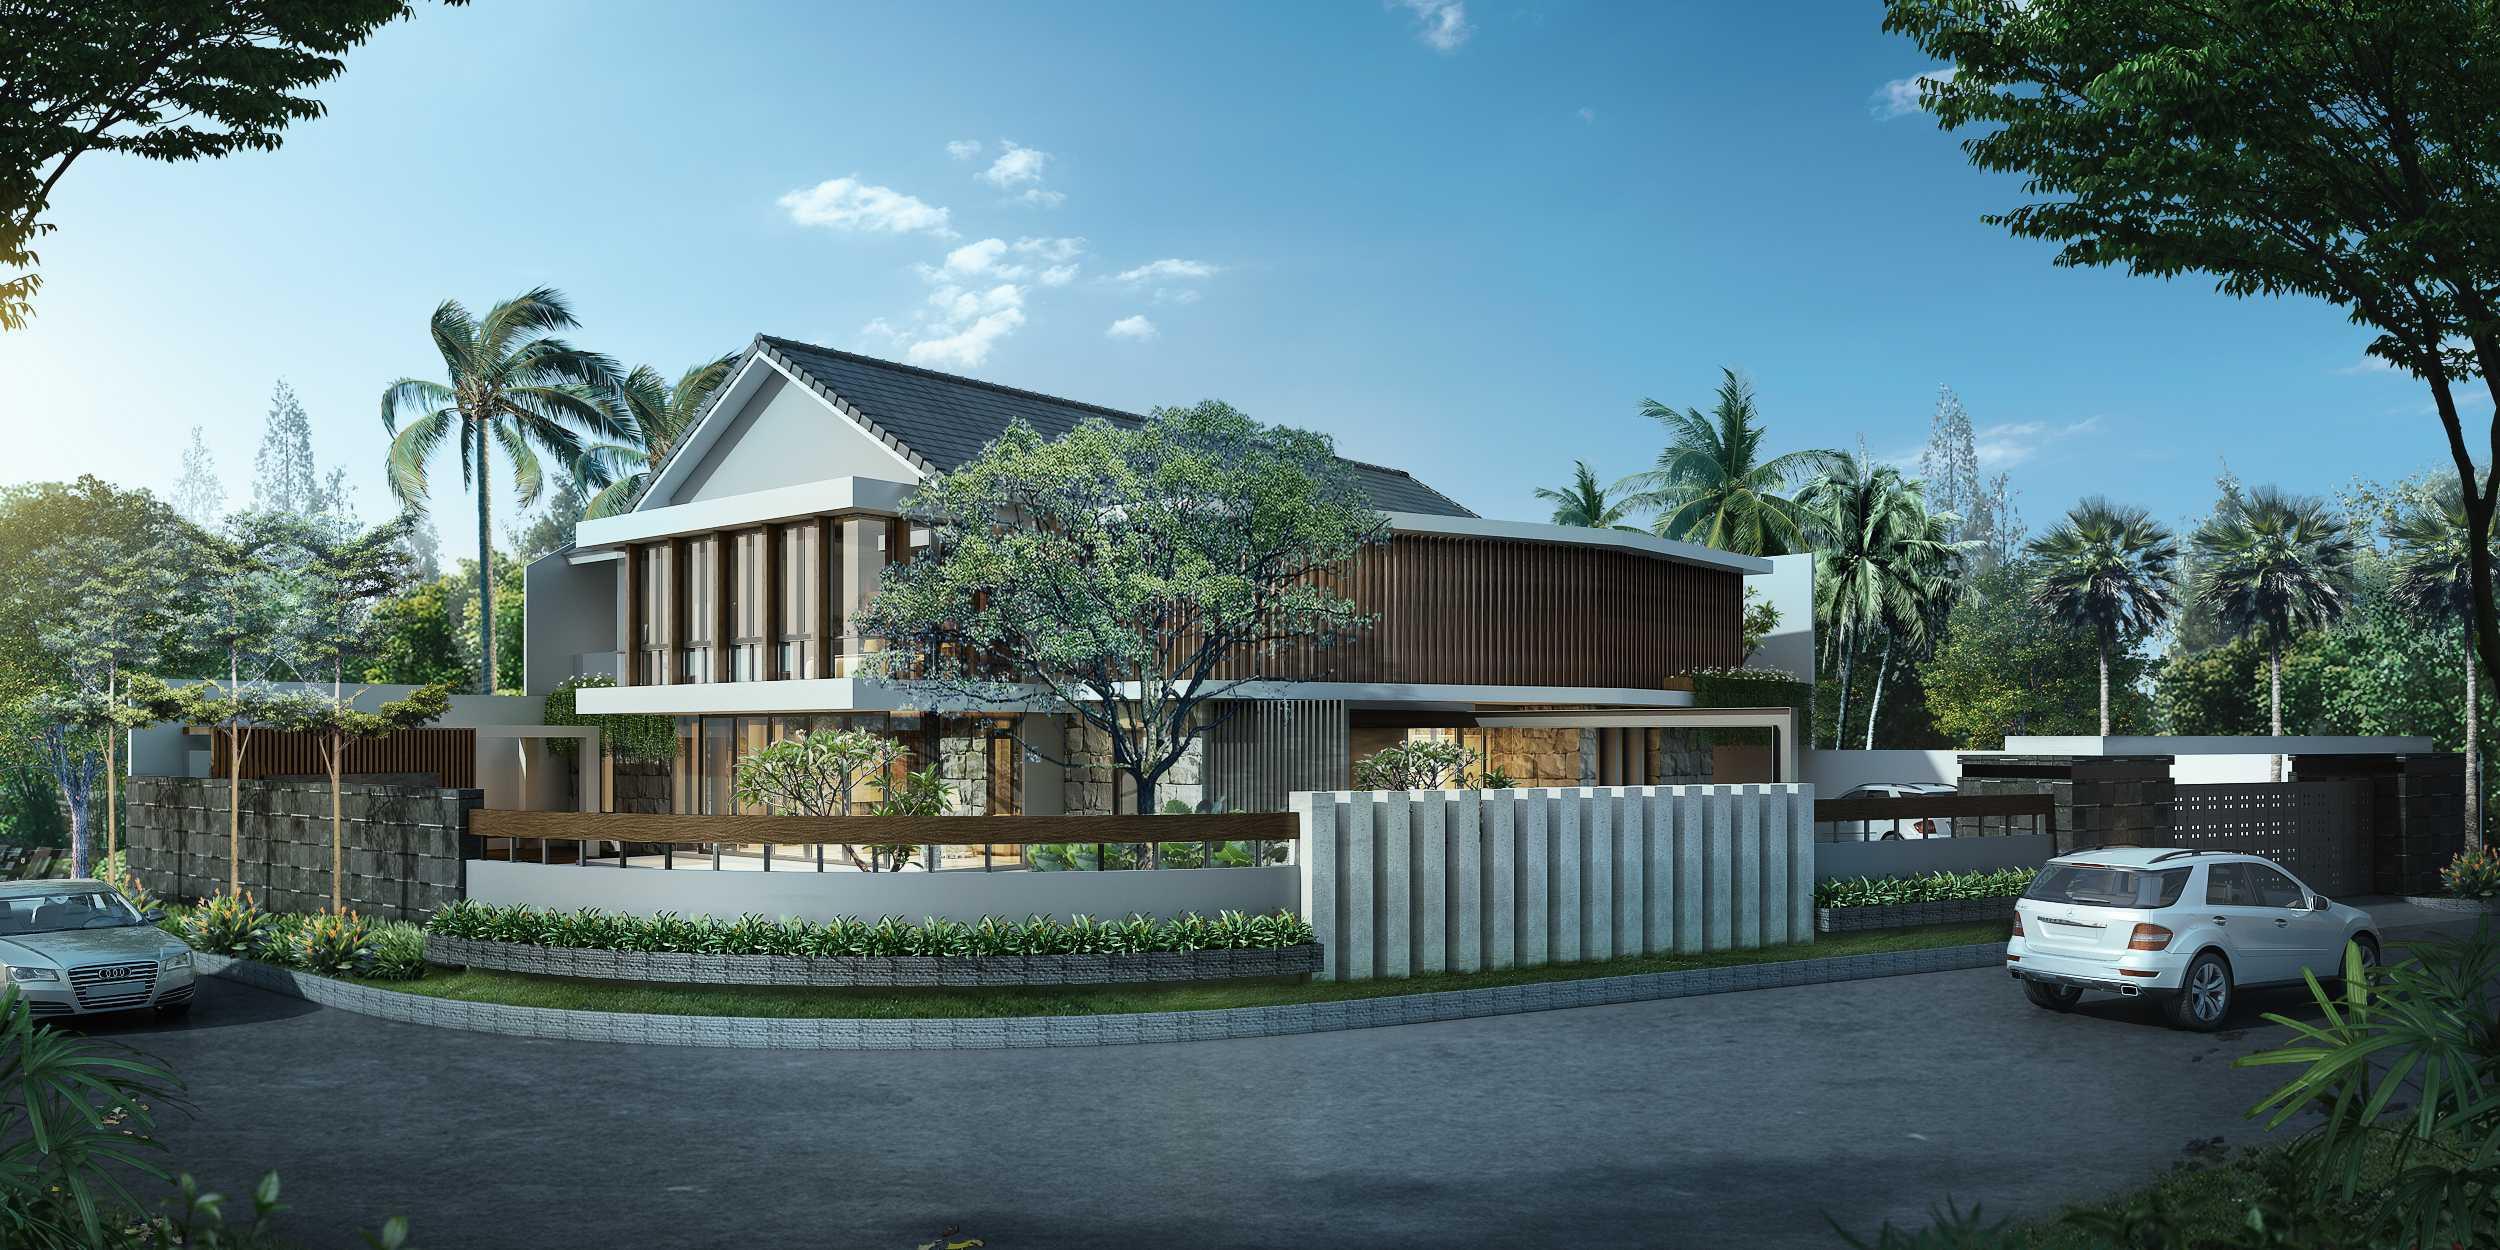 Agung Soejanto Architects Mg House Surabaya City, East Java, Indonesia Surabaya City, East Java, Indonesia  Kontemporer,tropis,modern  31197